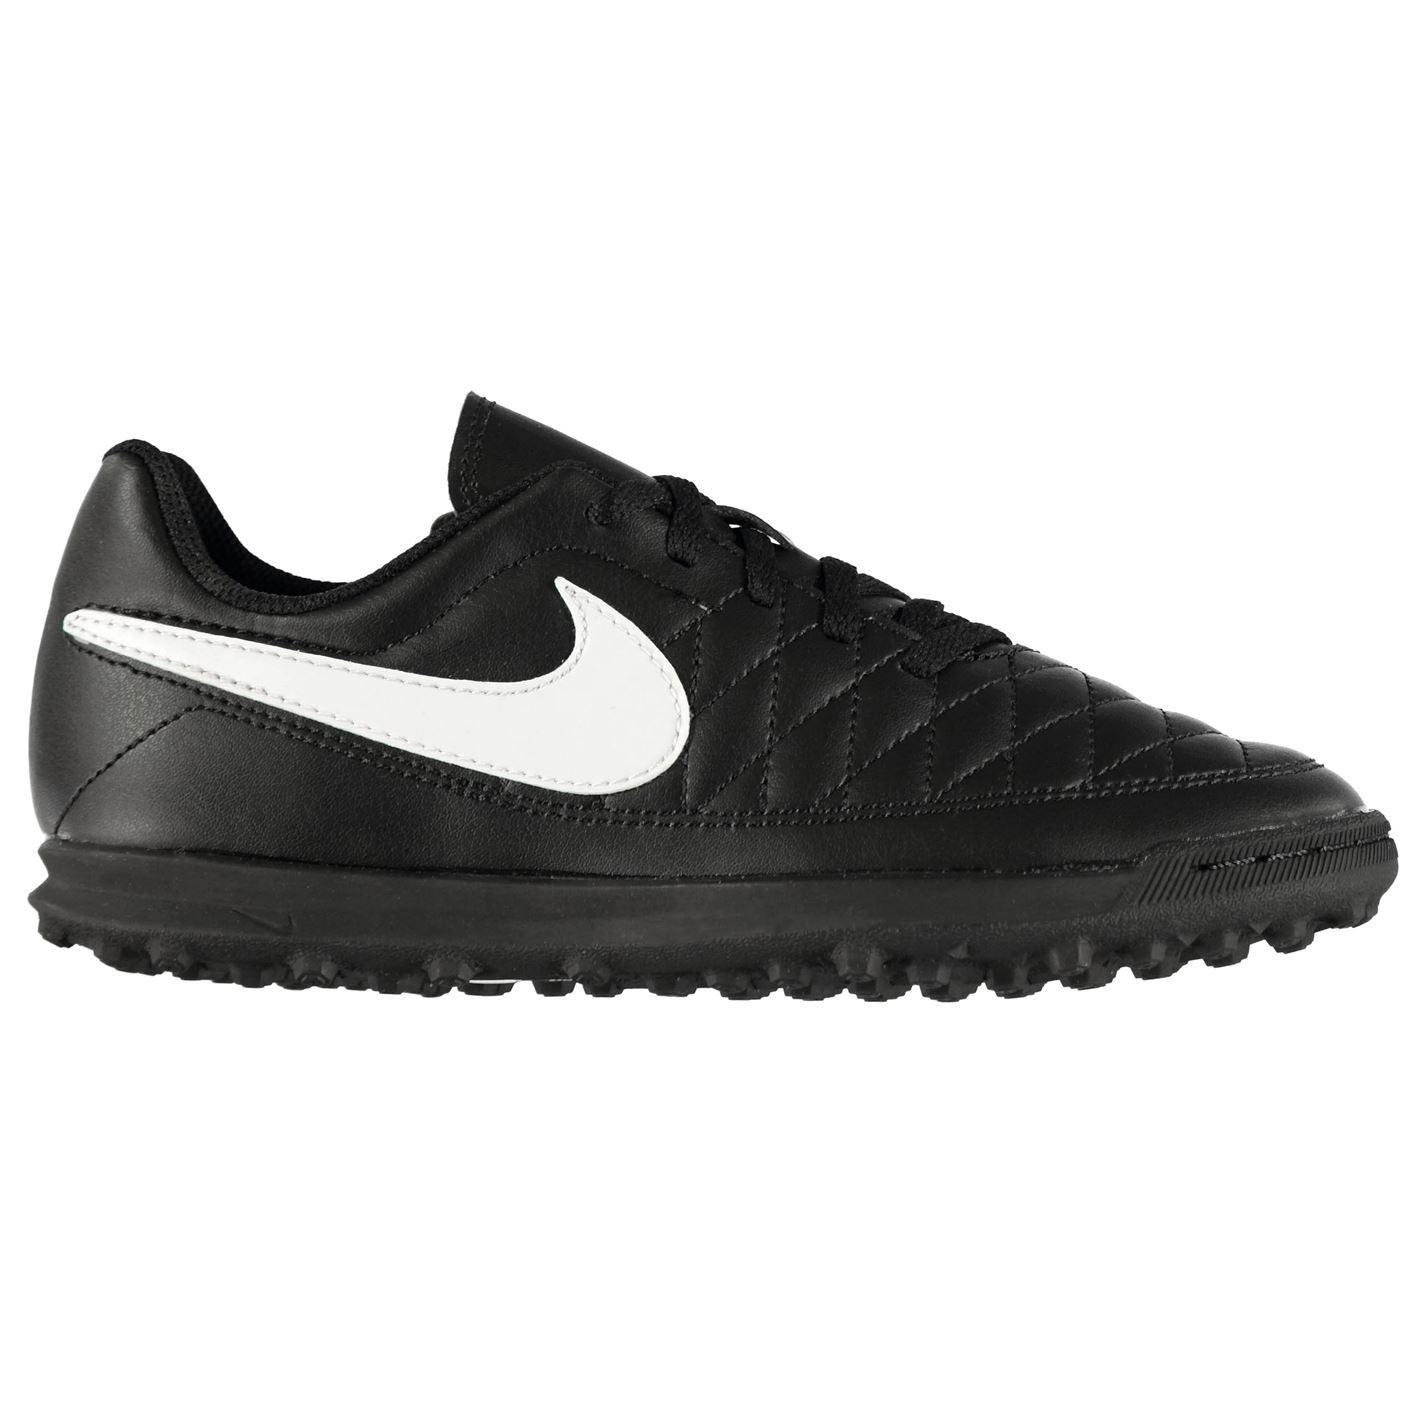 Nike-majestry-Astro-Turf-Football-Baskets-Juniors-Football-Baskets-Chaussures miniature 7